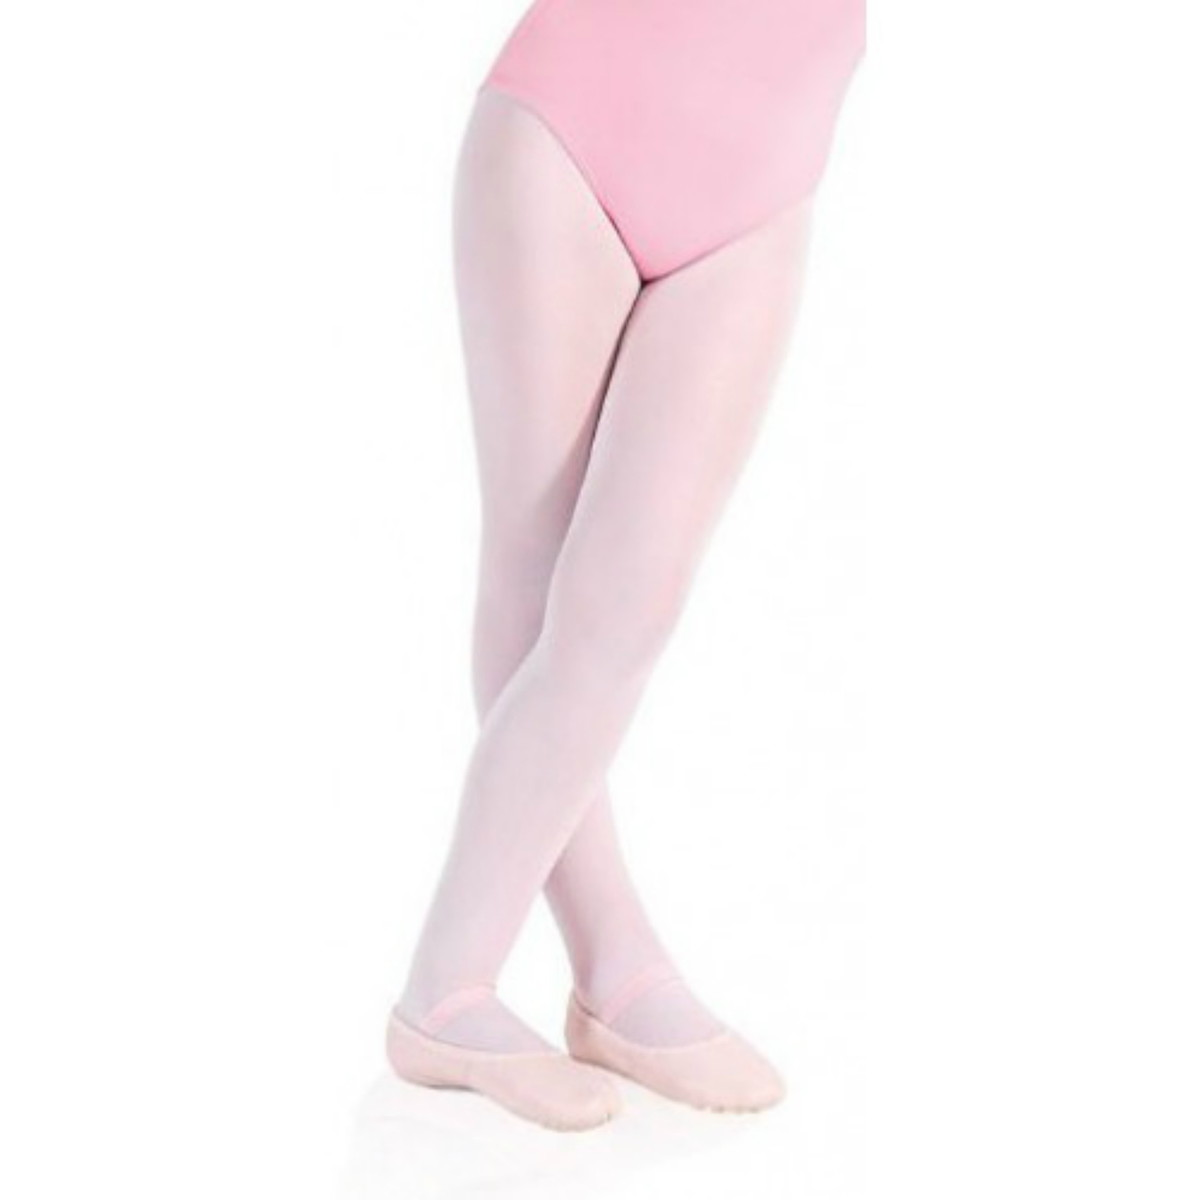 f4cfde470 Meia Calça Ballet Infantil Rosa no Elo7